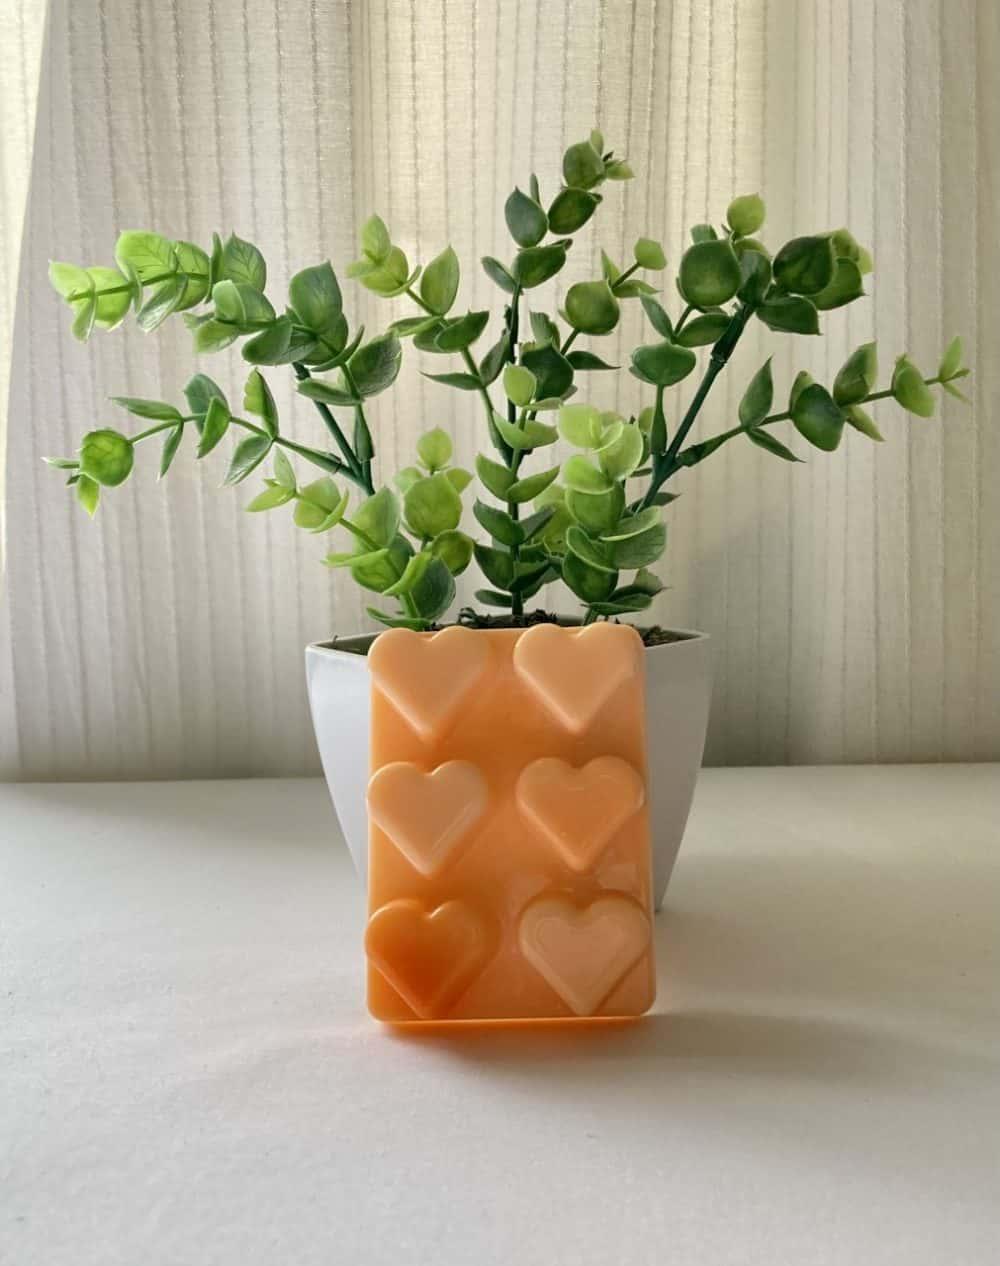 Heart Orange Eco Friendly Products